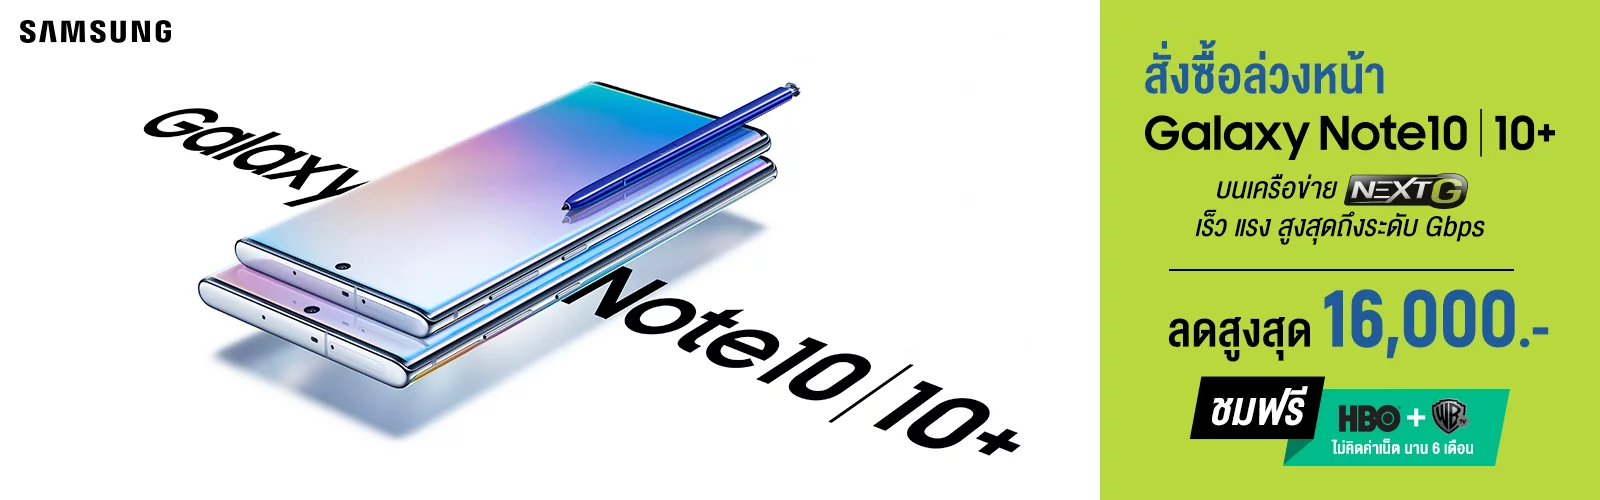 AIS ประกาศเปิดจอง Samsung Galaxy NOTE 10